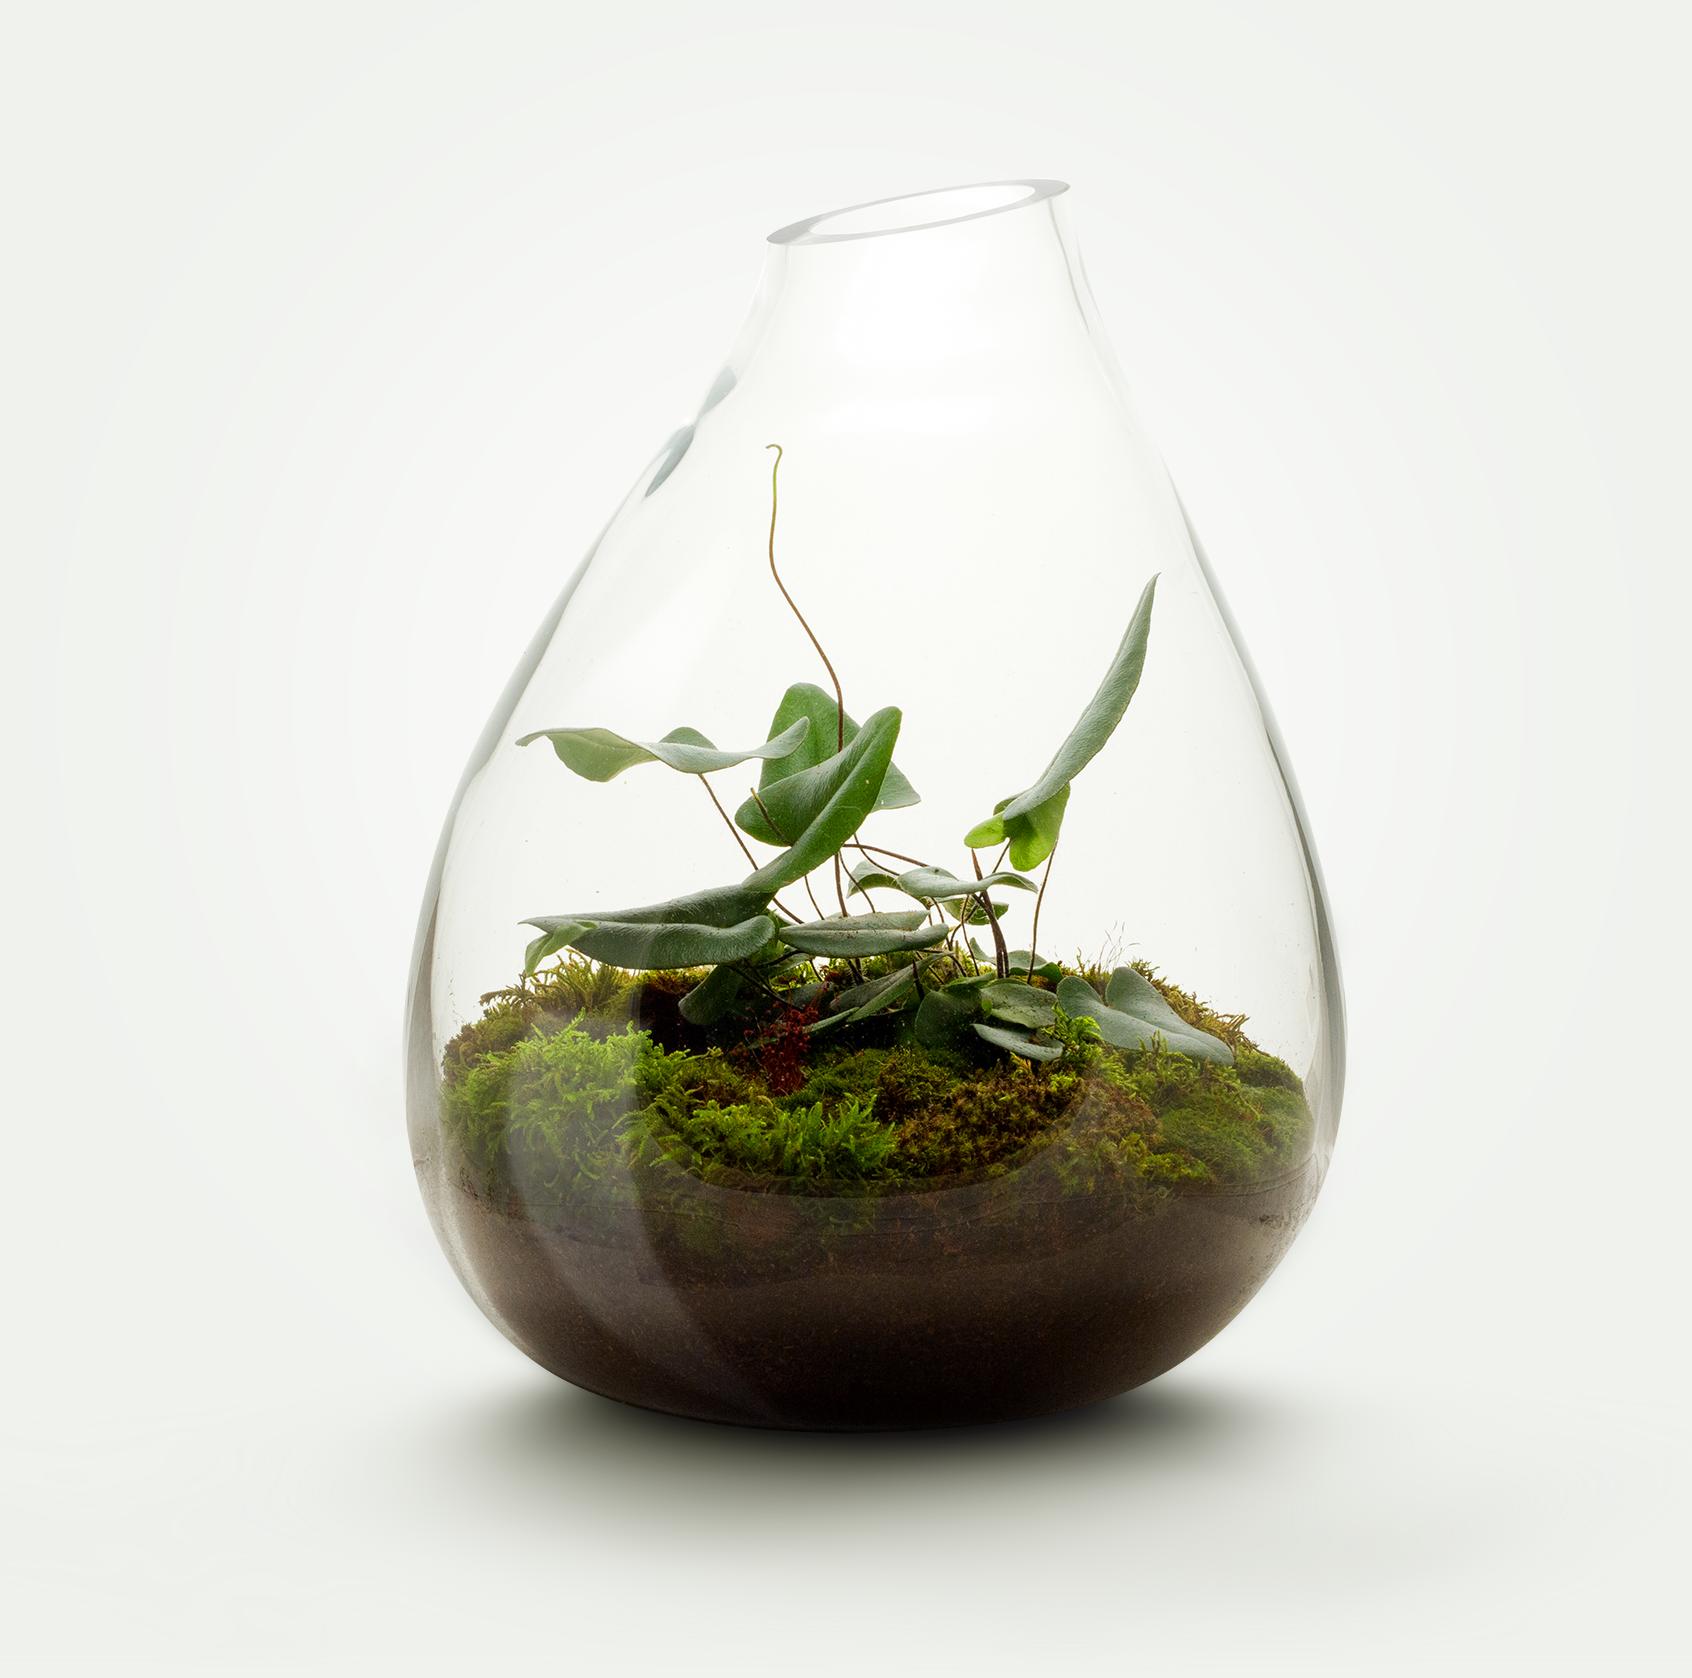 MIŠKO SAMANA + Heart Fern - Įeinantys augalai:  Miško samana, Hemionitis Arifolia